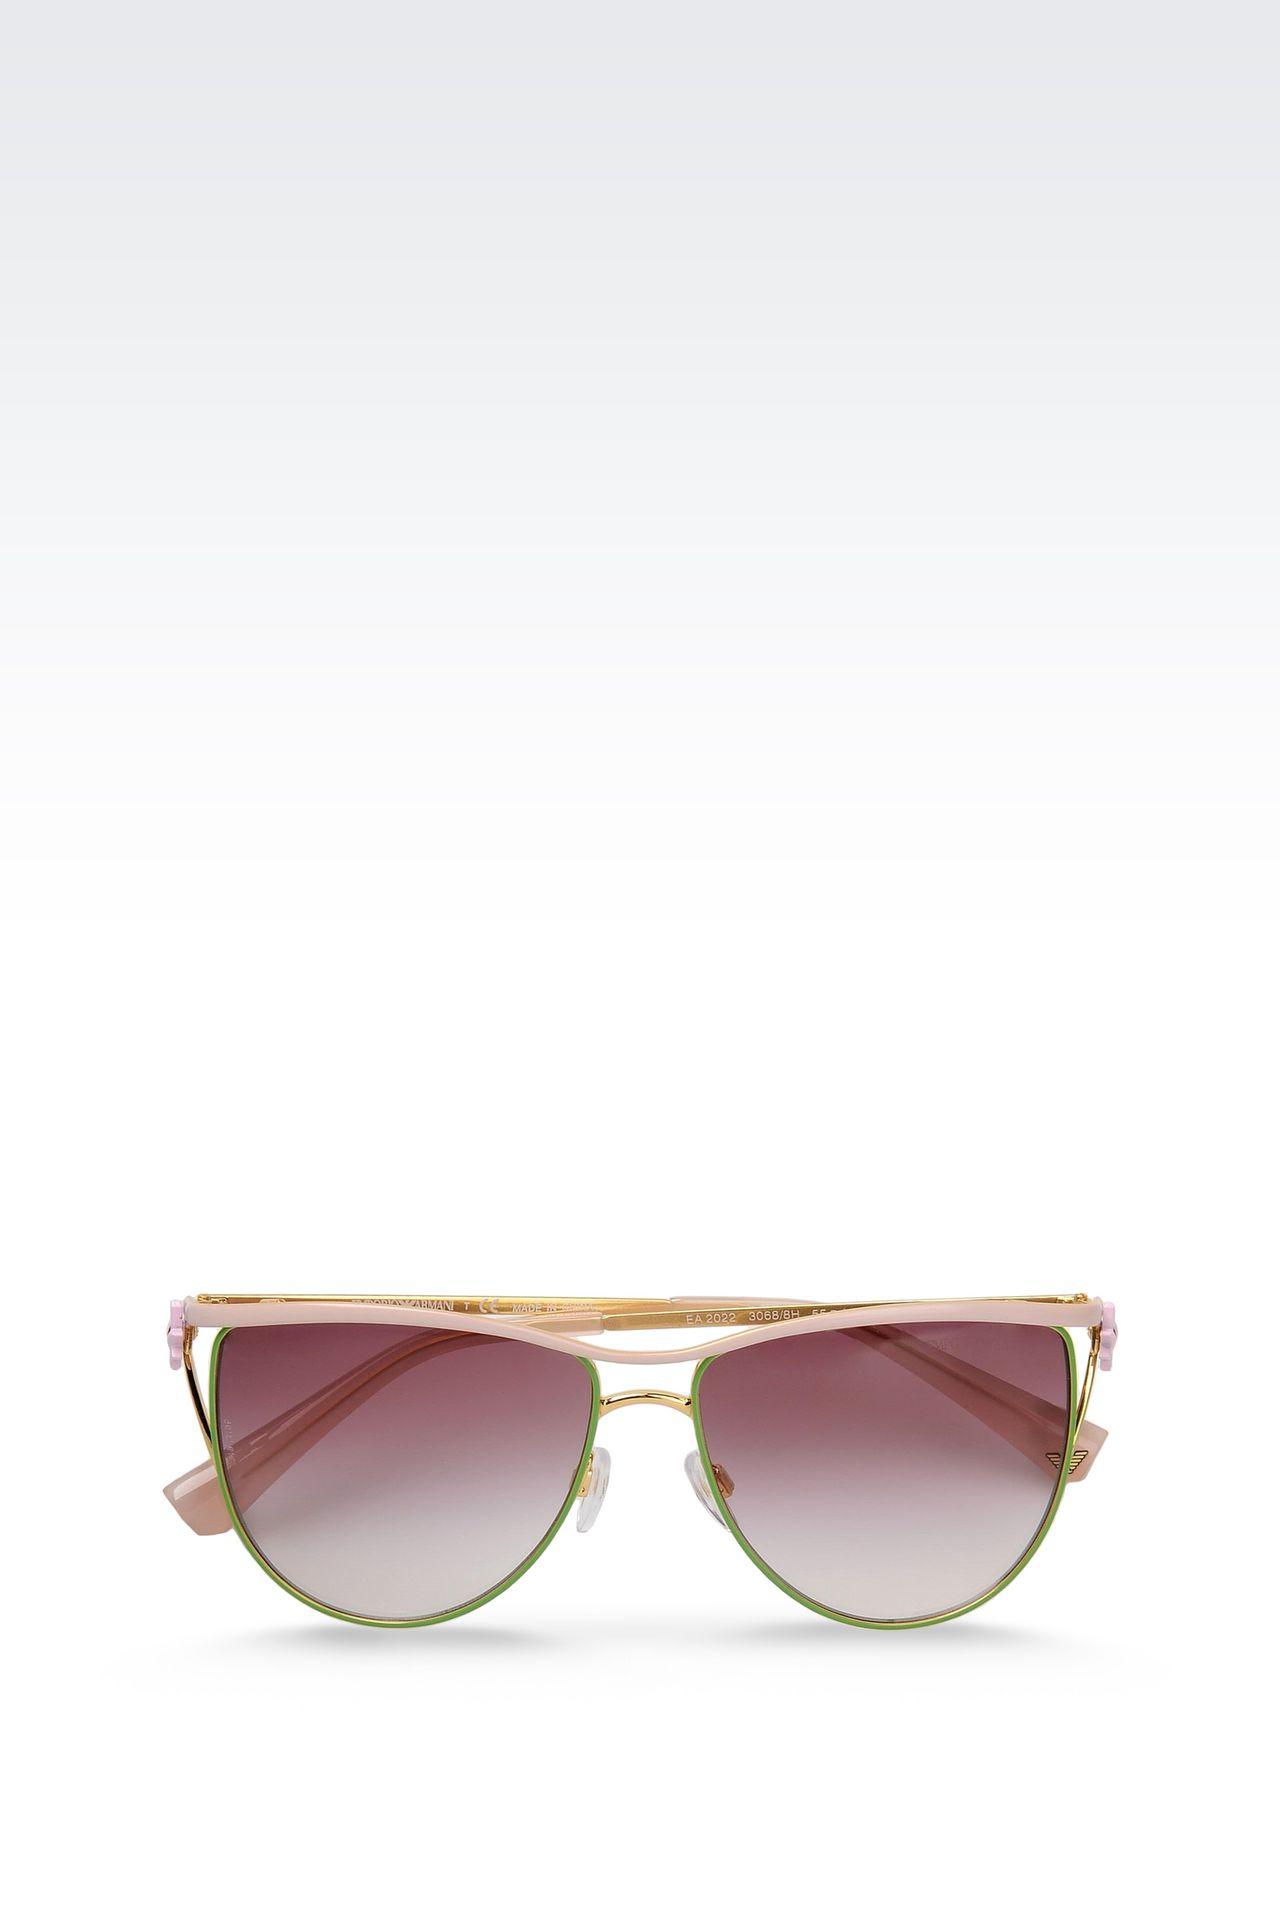 designer sunglasses women  armani women